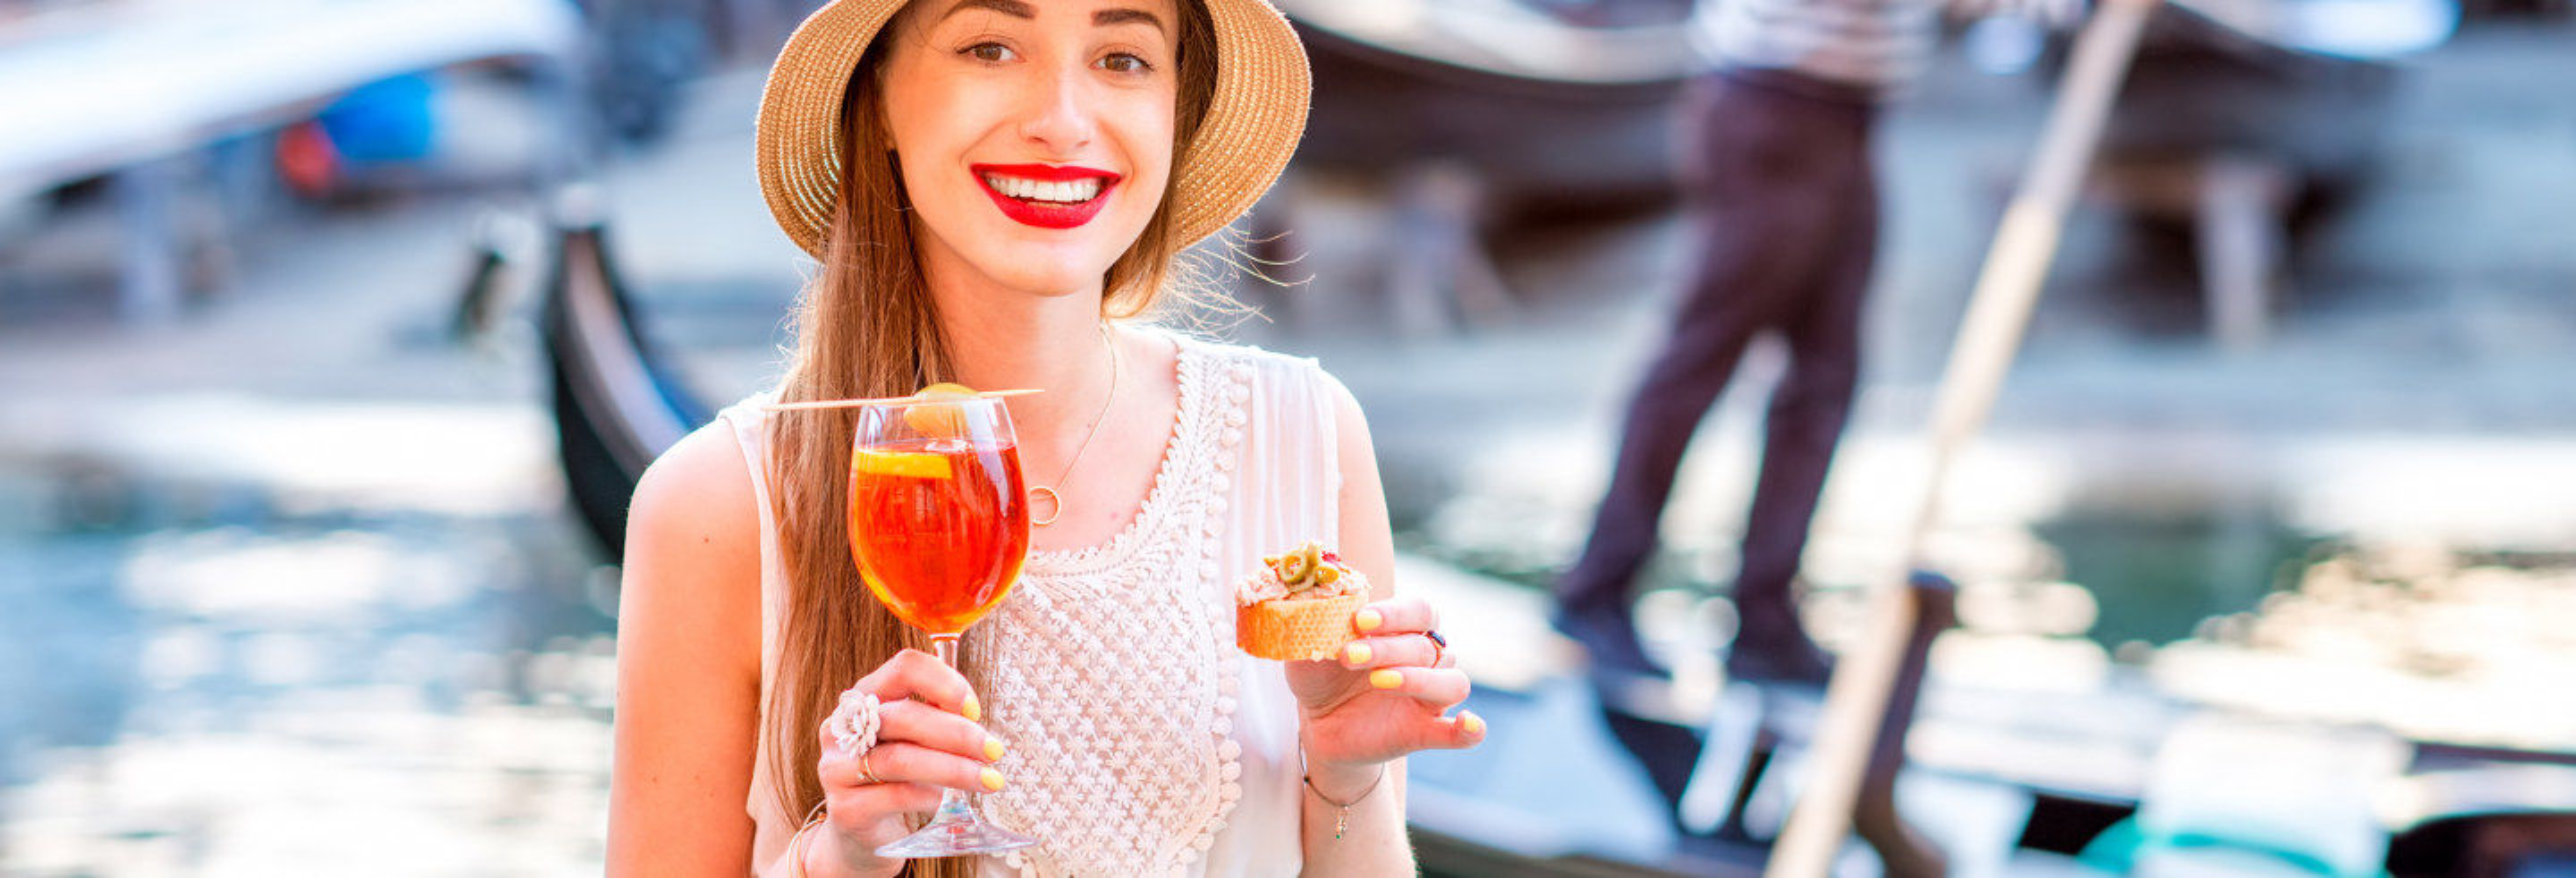 Degustazione di vini veneziani